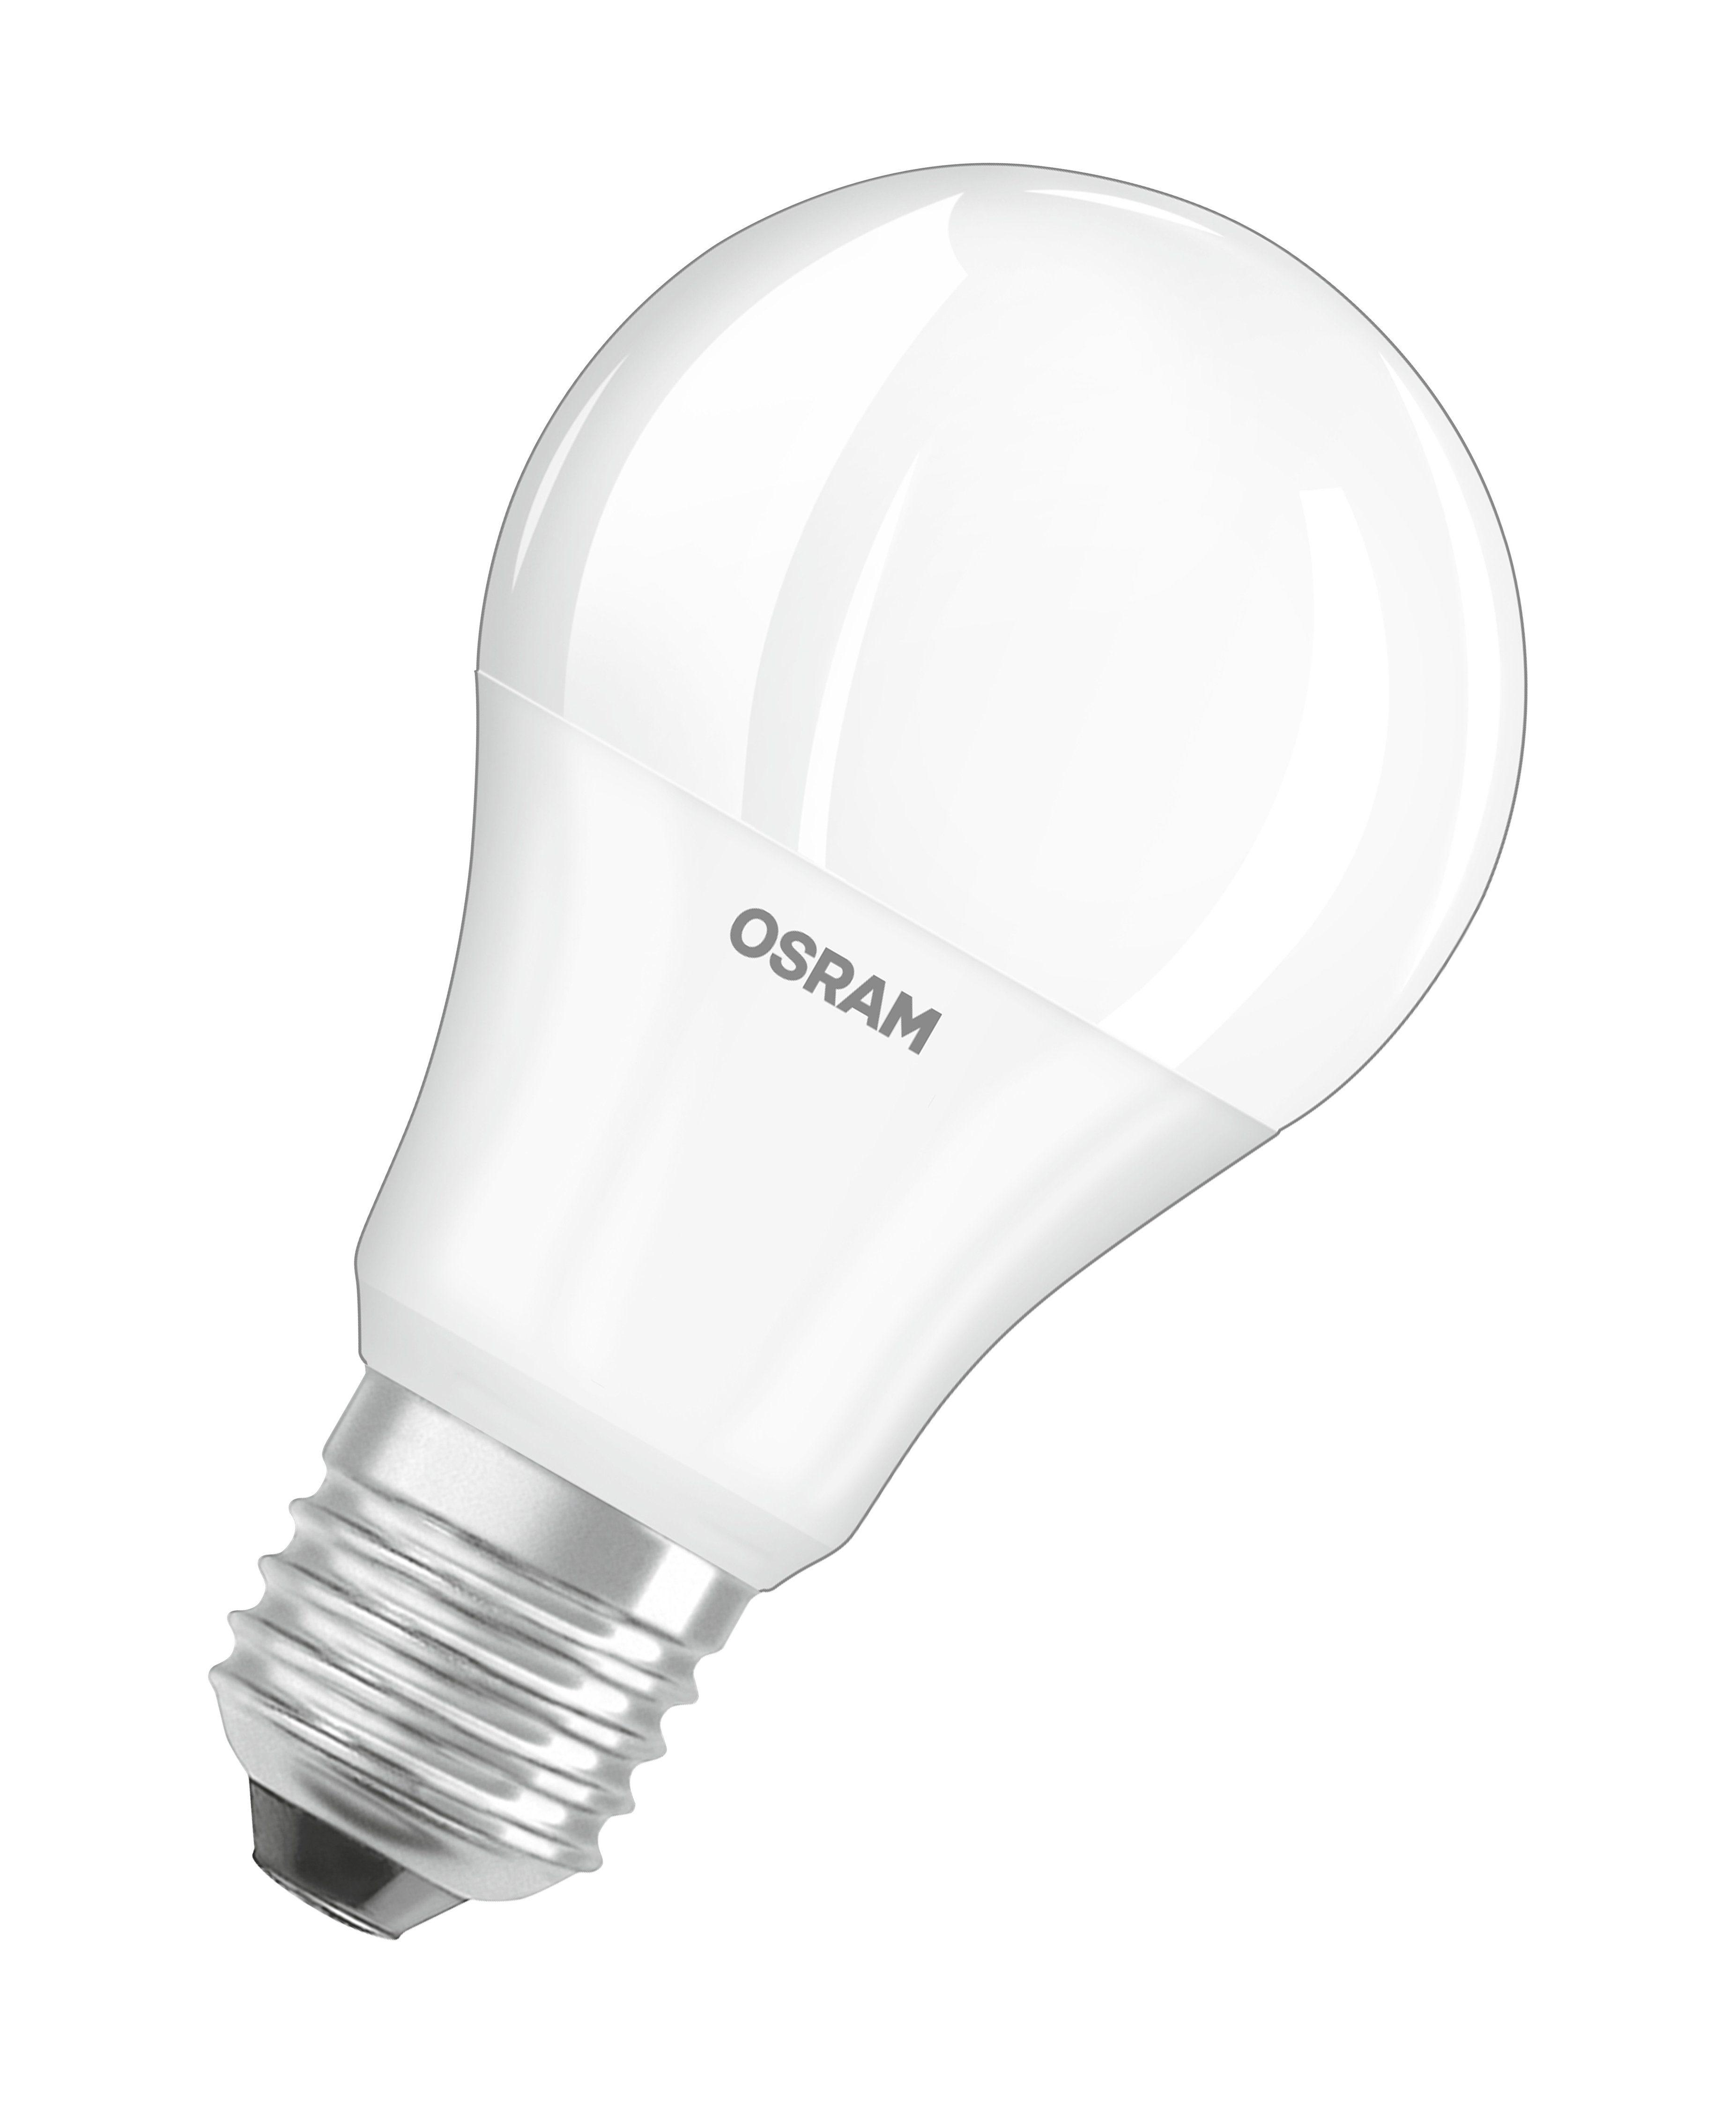 Osram LED SUPERSTAR CLASSIC A, dimmbare LED-Lampe »SST CLAS A 75 DIM 10.5 W/827 E27 FR«